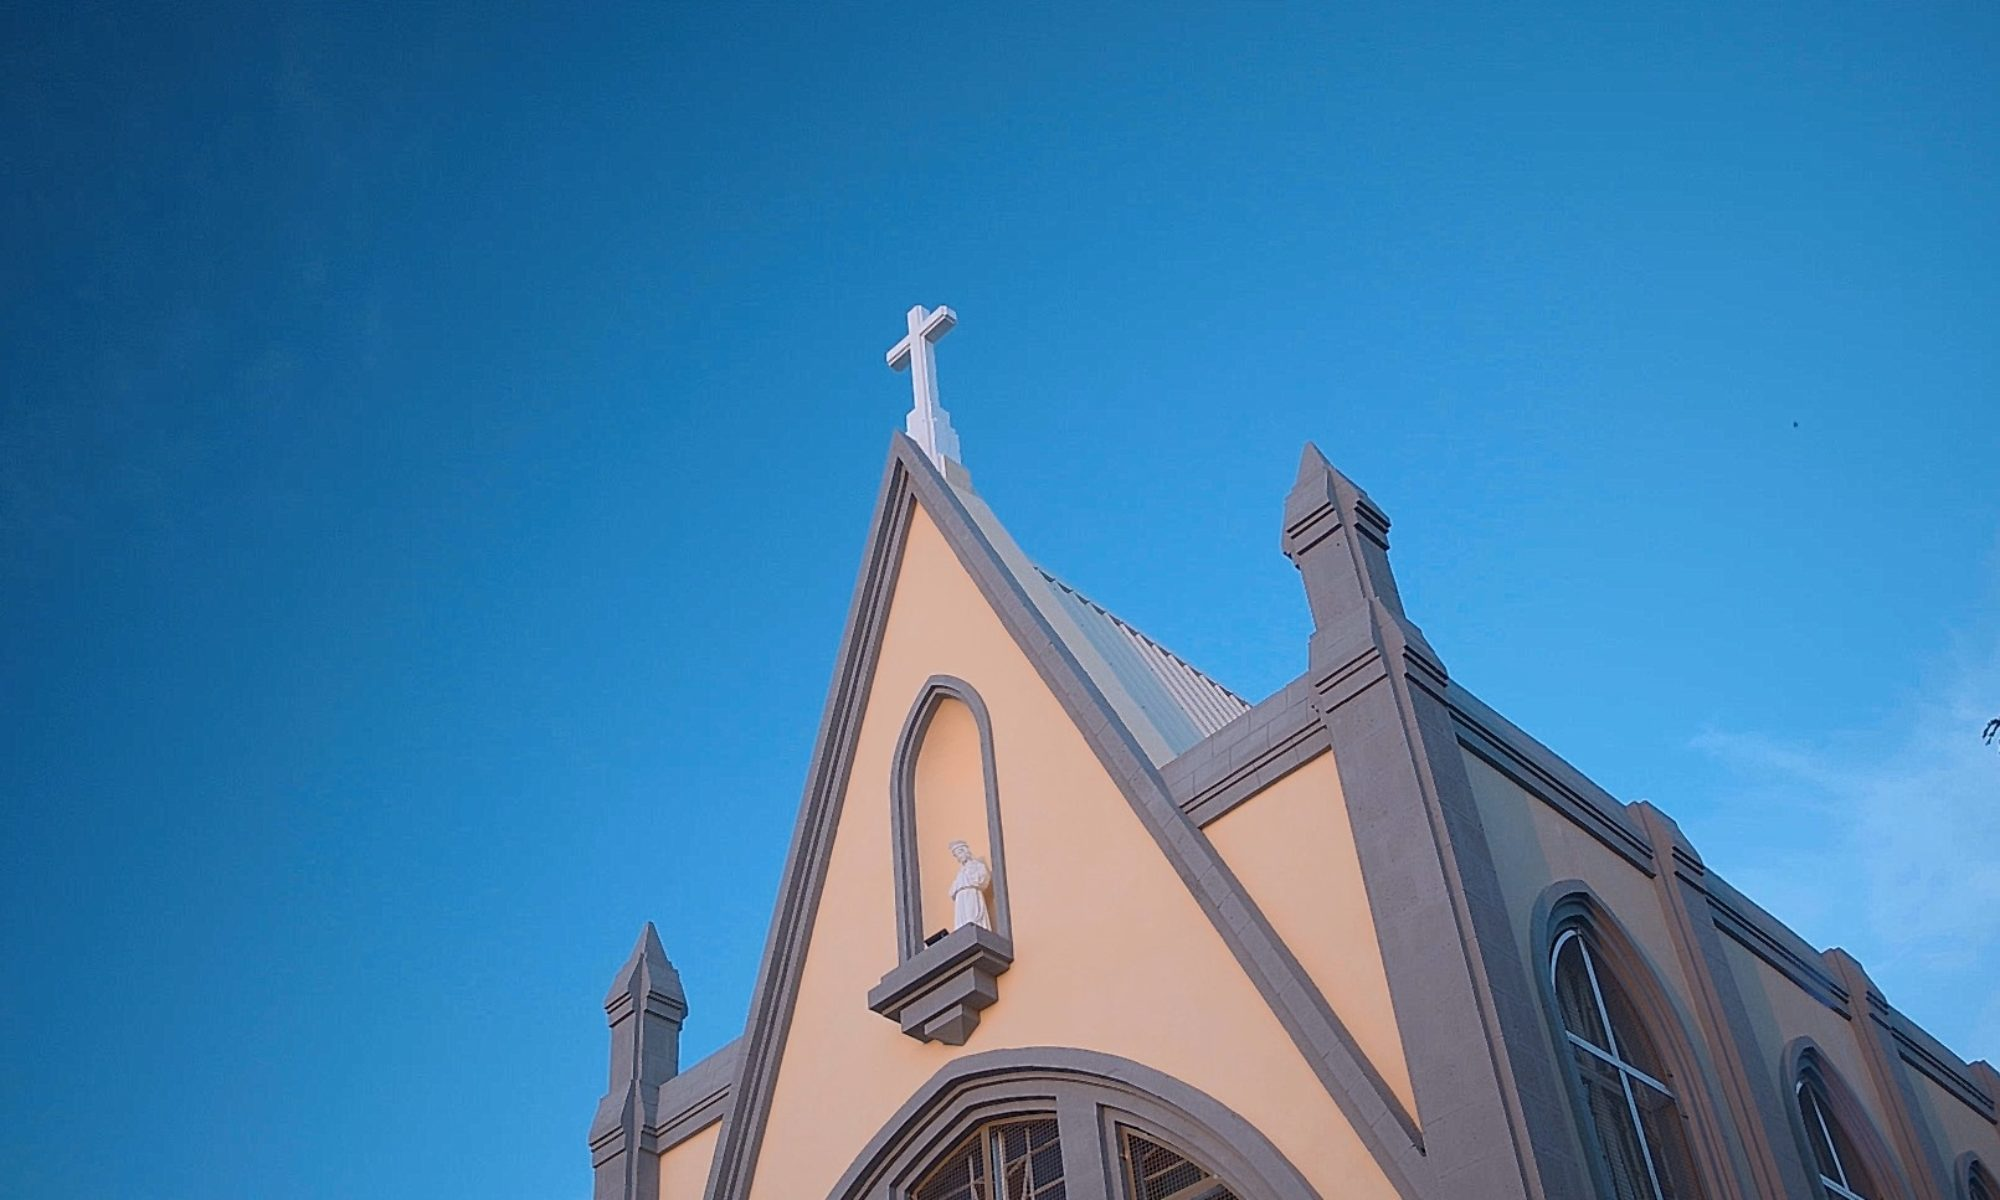 Église 2.0